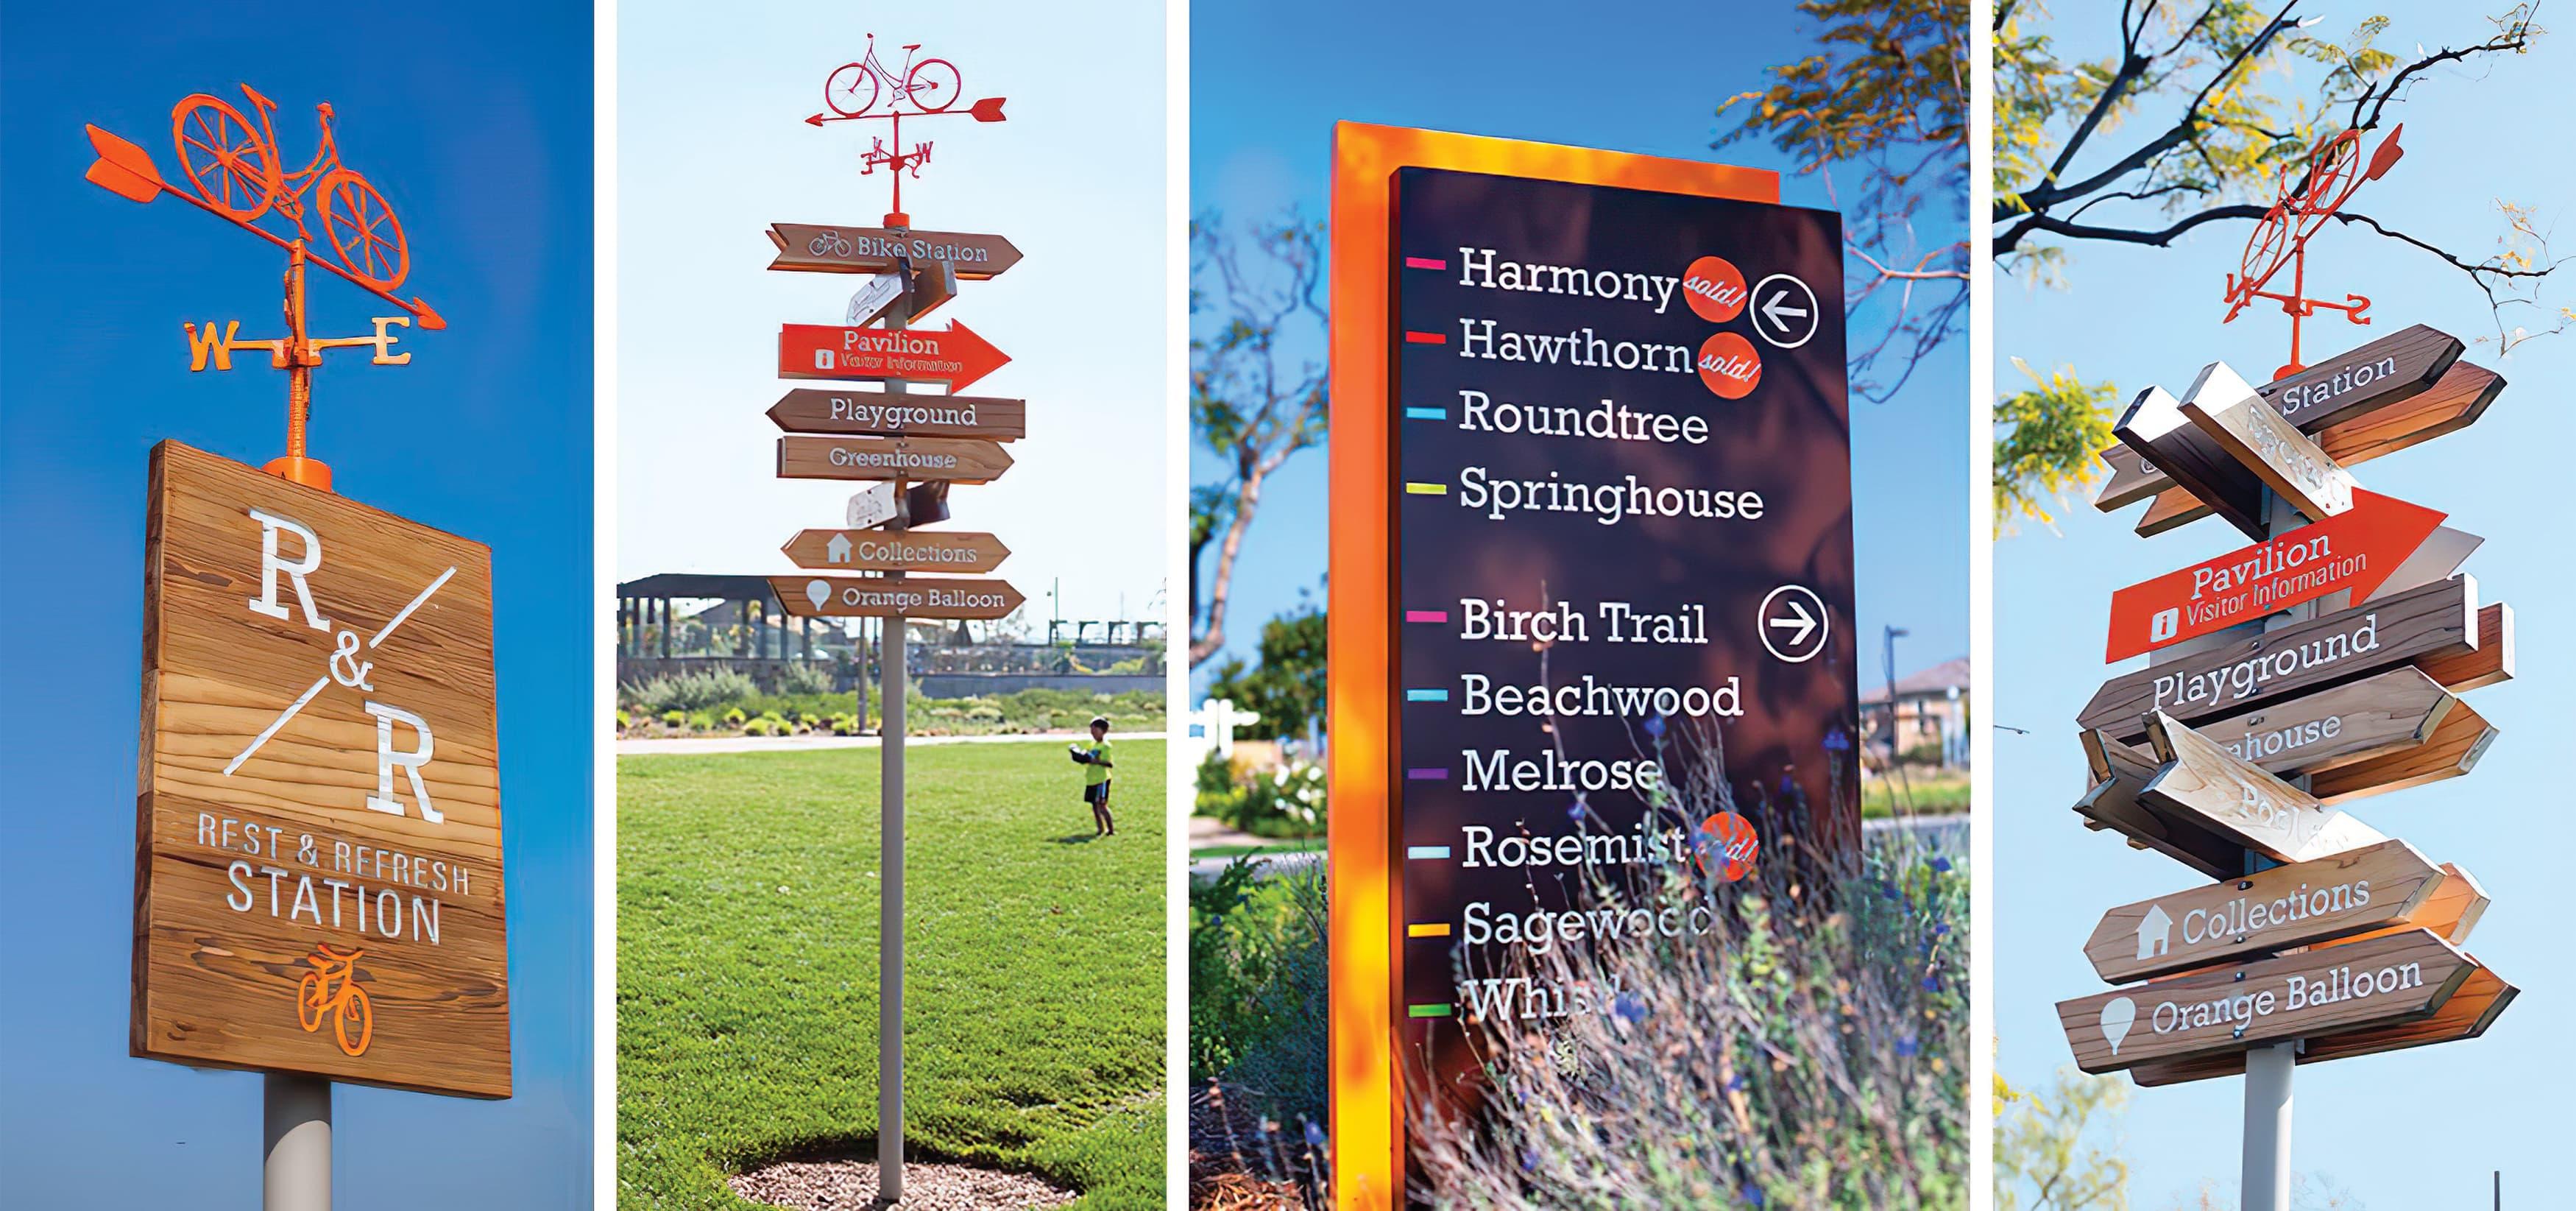 Pavilion Park. Irvine Great Park. Residential Community Park Design. Park Pedestrian Wayfinding Signage.